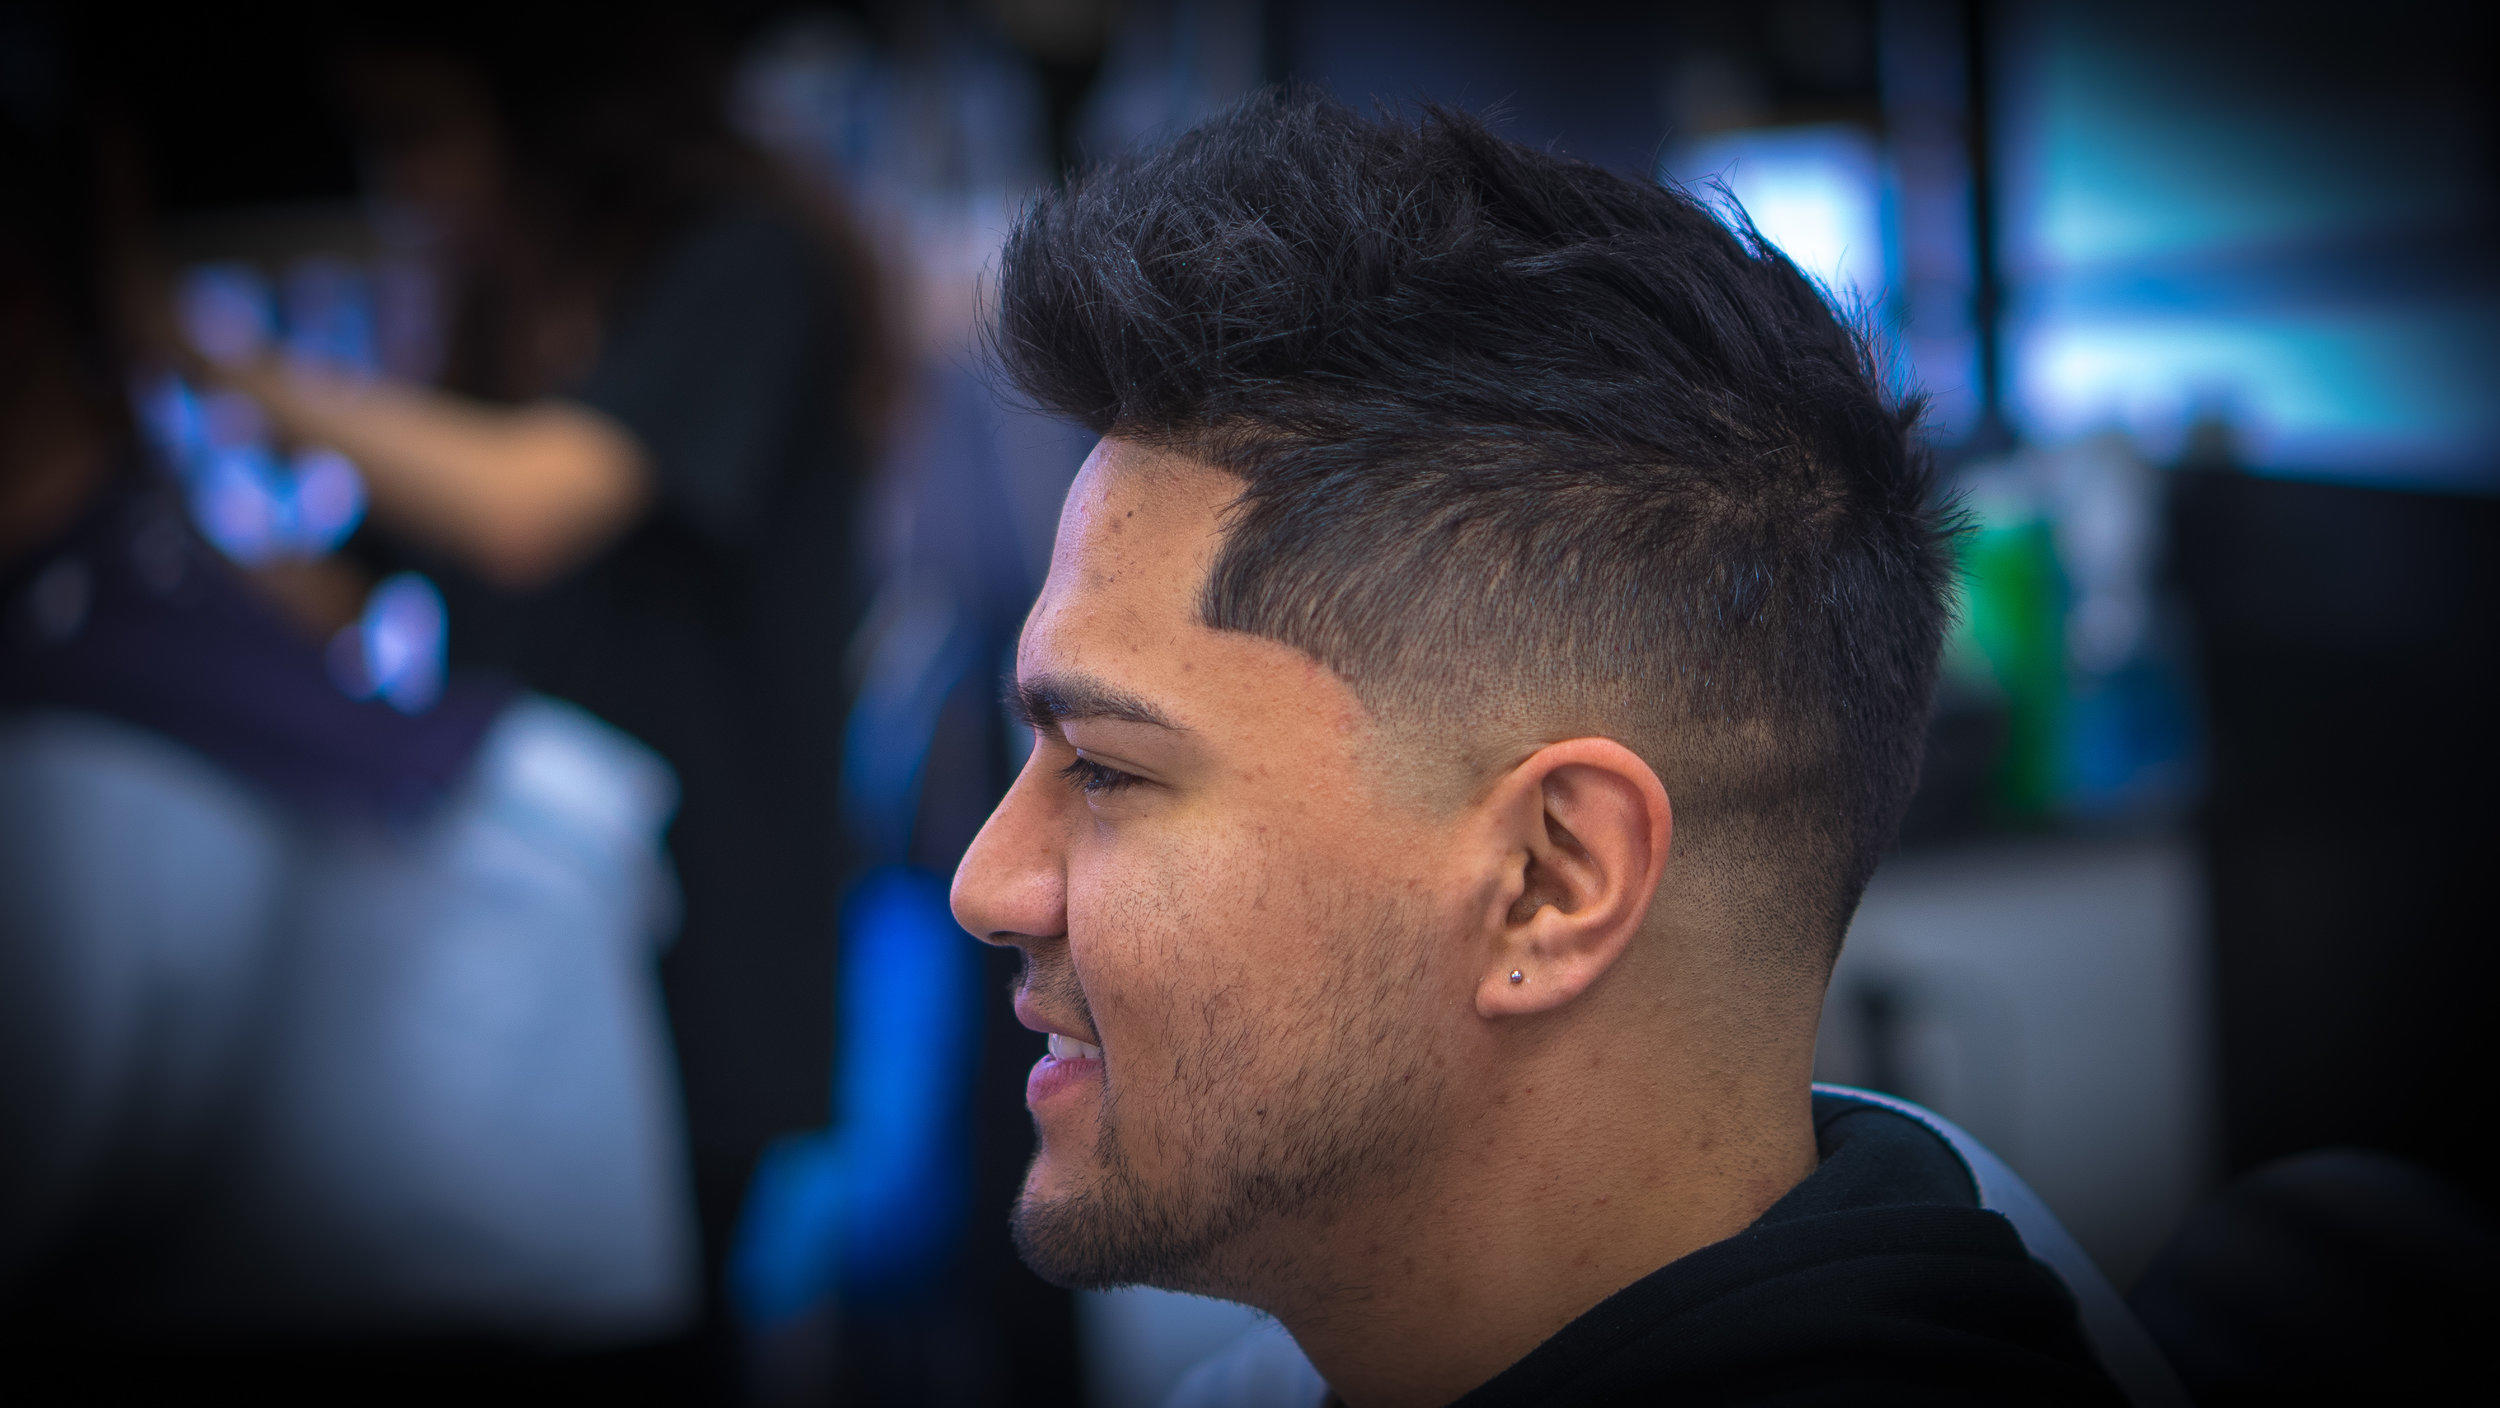 Galindo's Barbershop East image 5